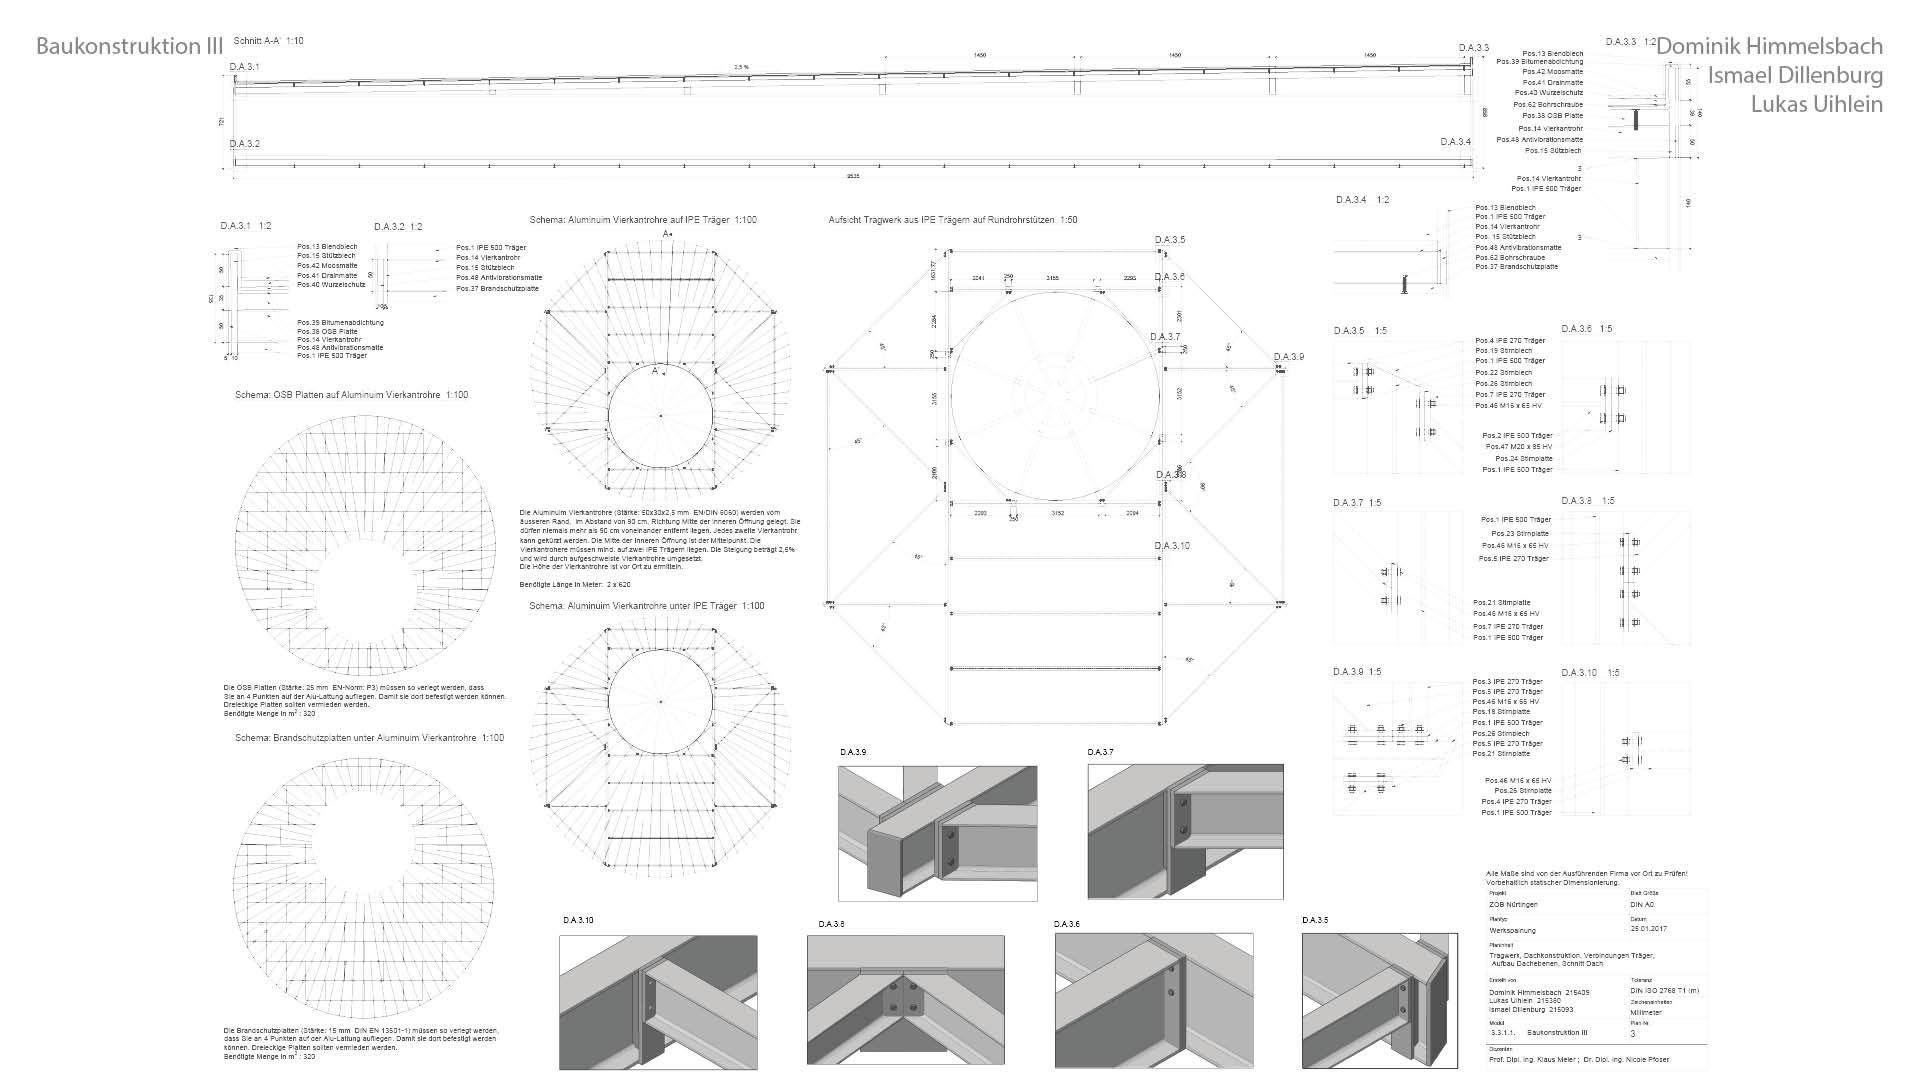 11 16 3 Baukonstruktion 3